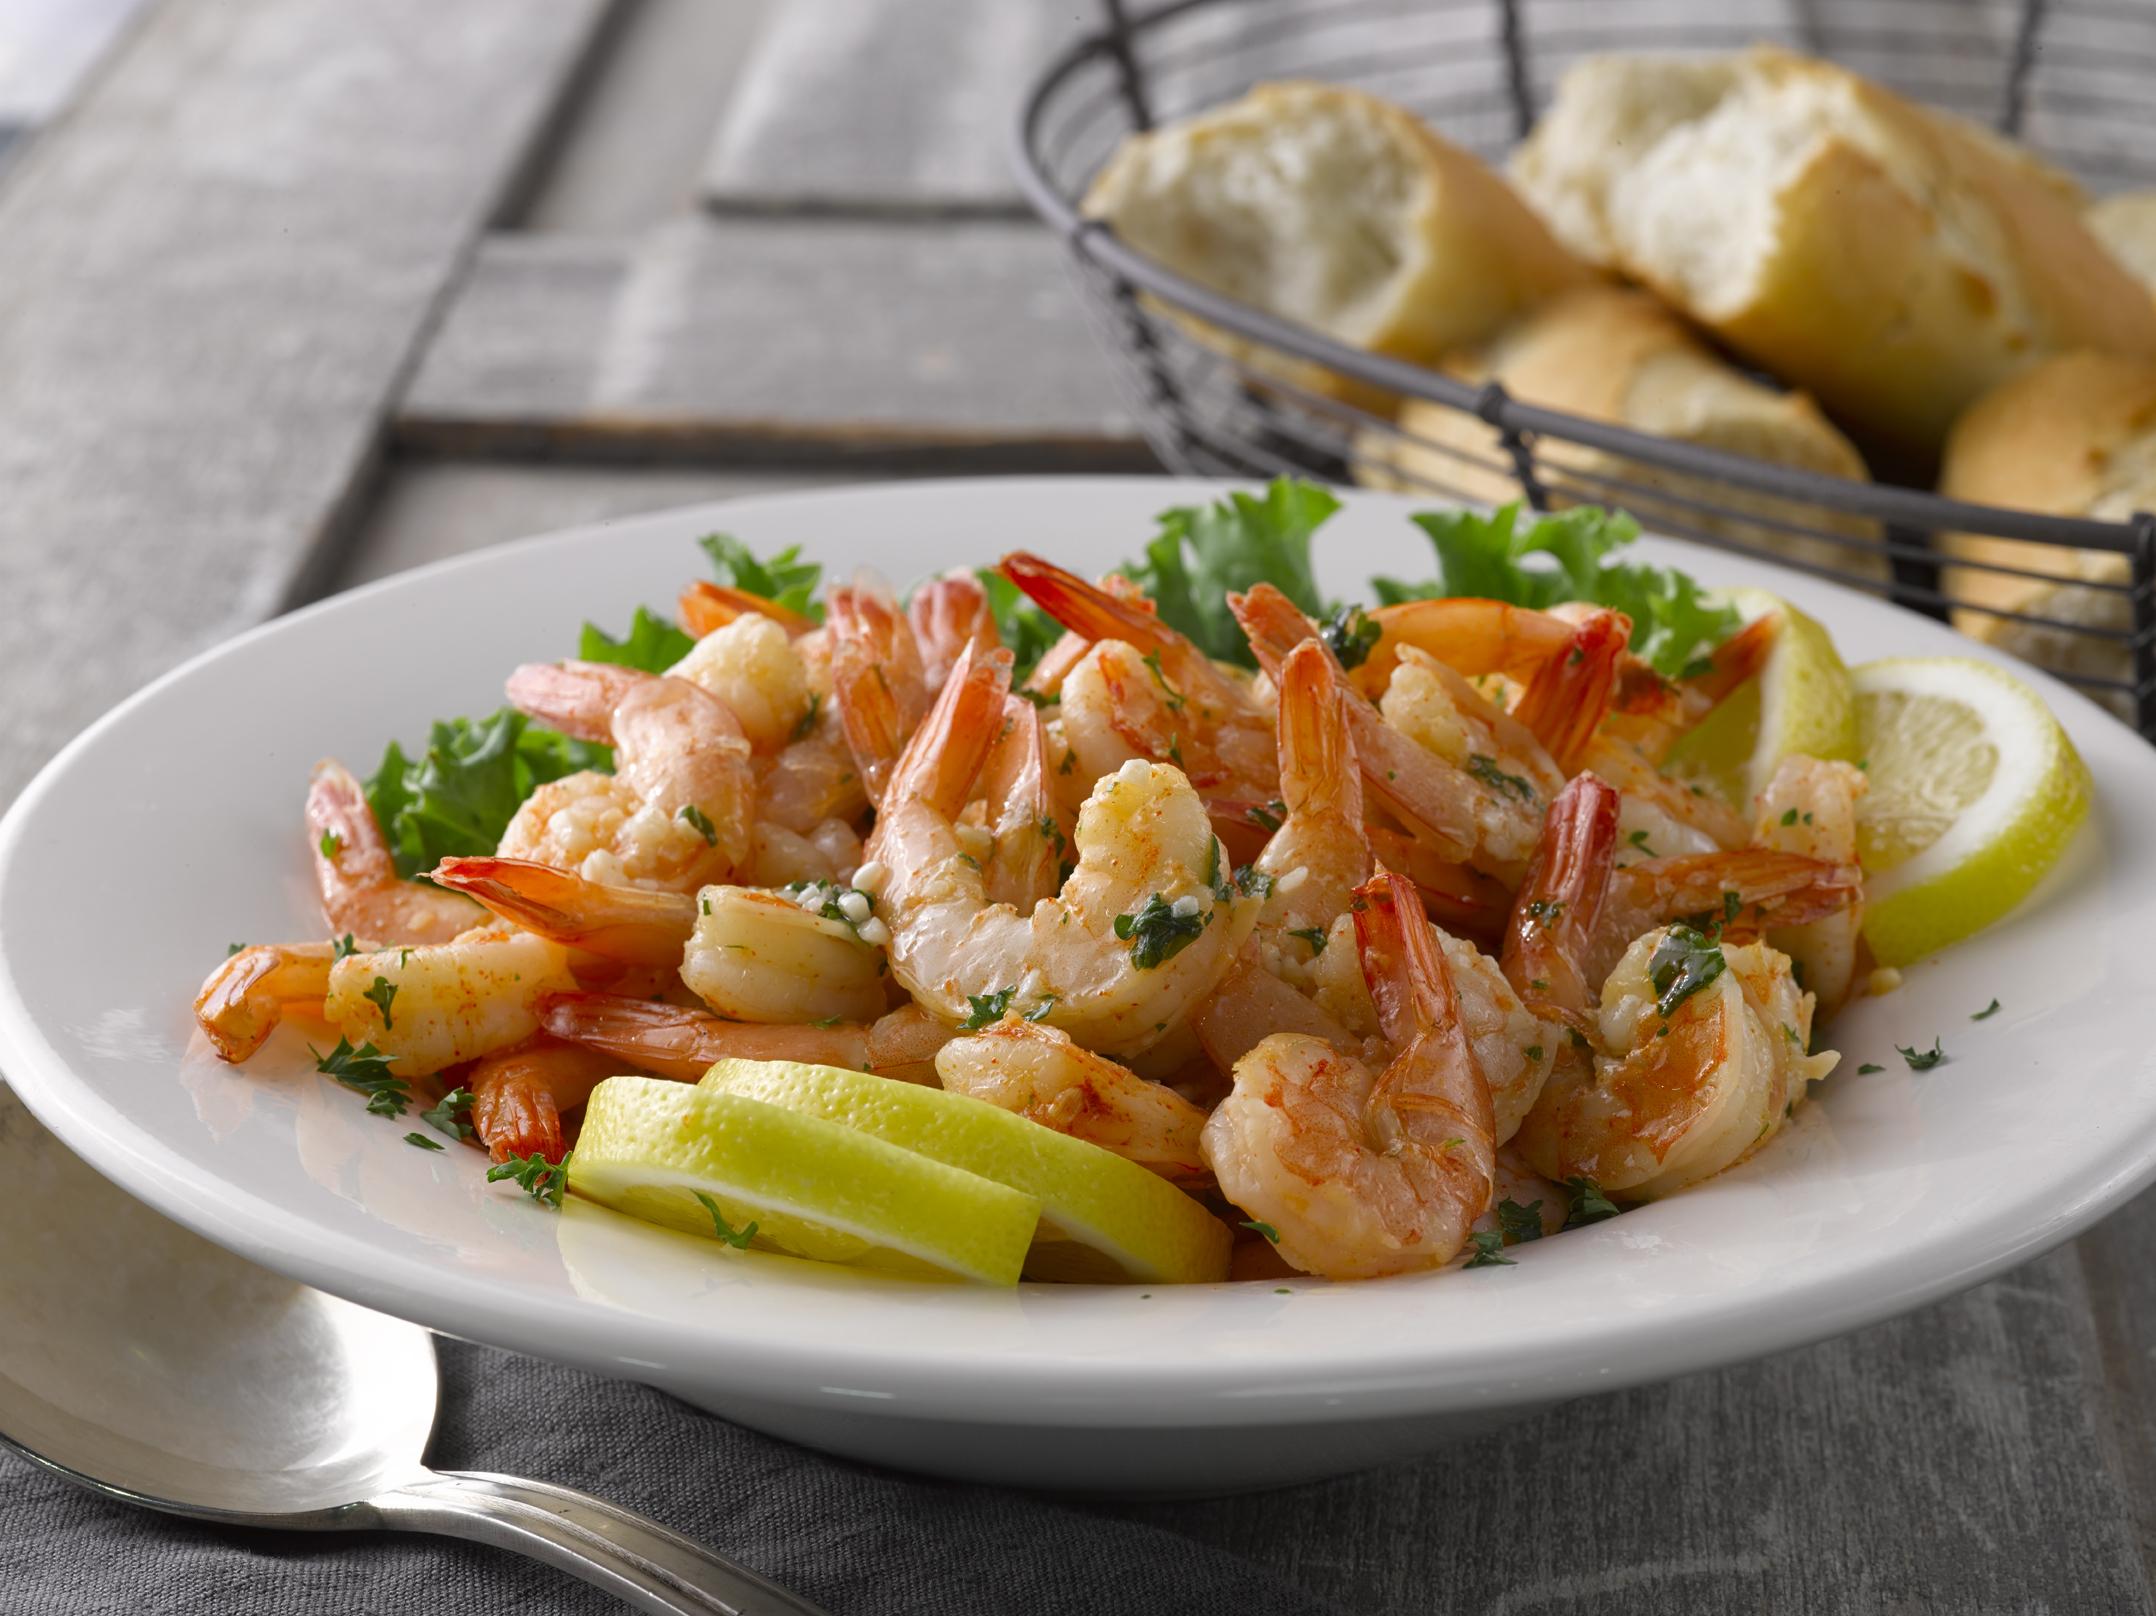 Grilled Shrimp Scampi in Foil Packets | Recipes & Meals ...